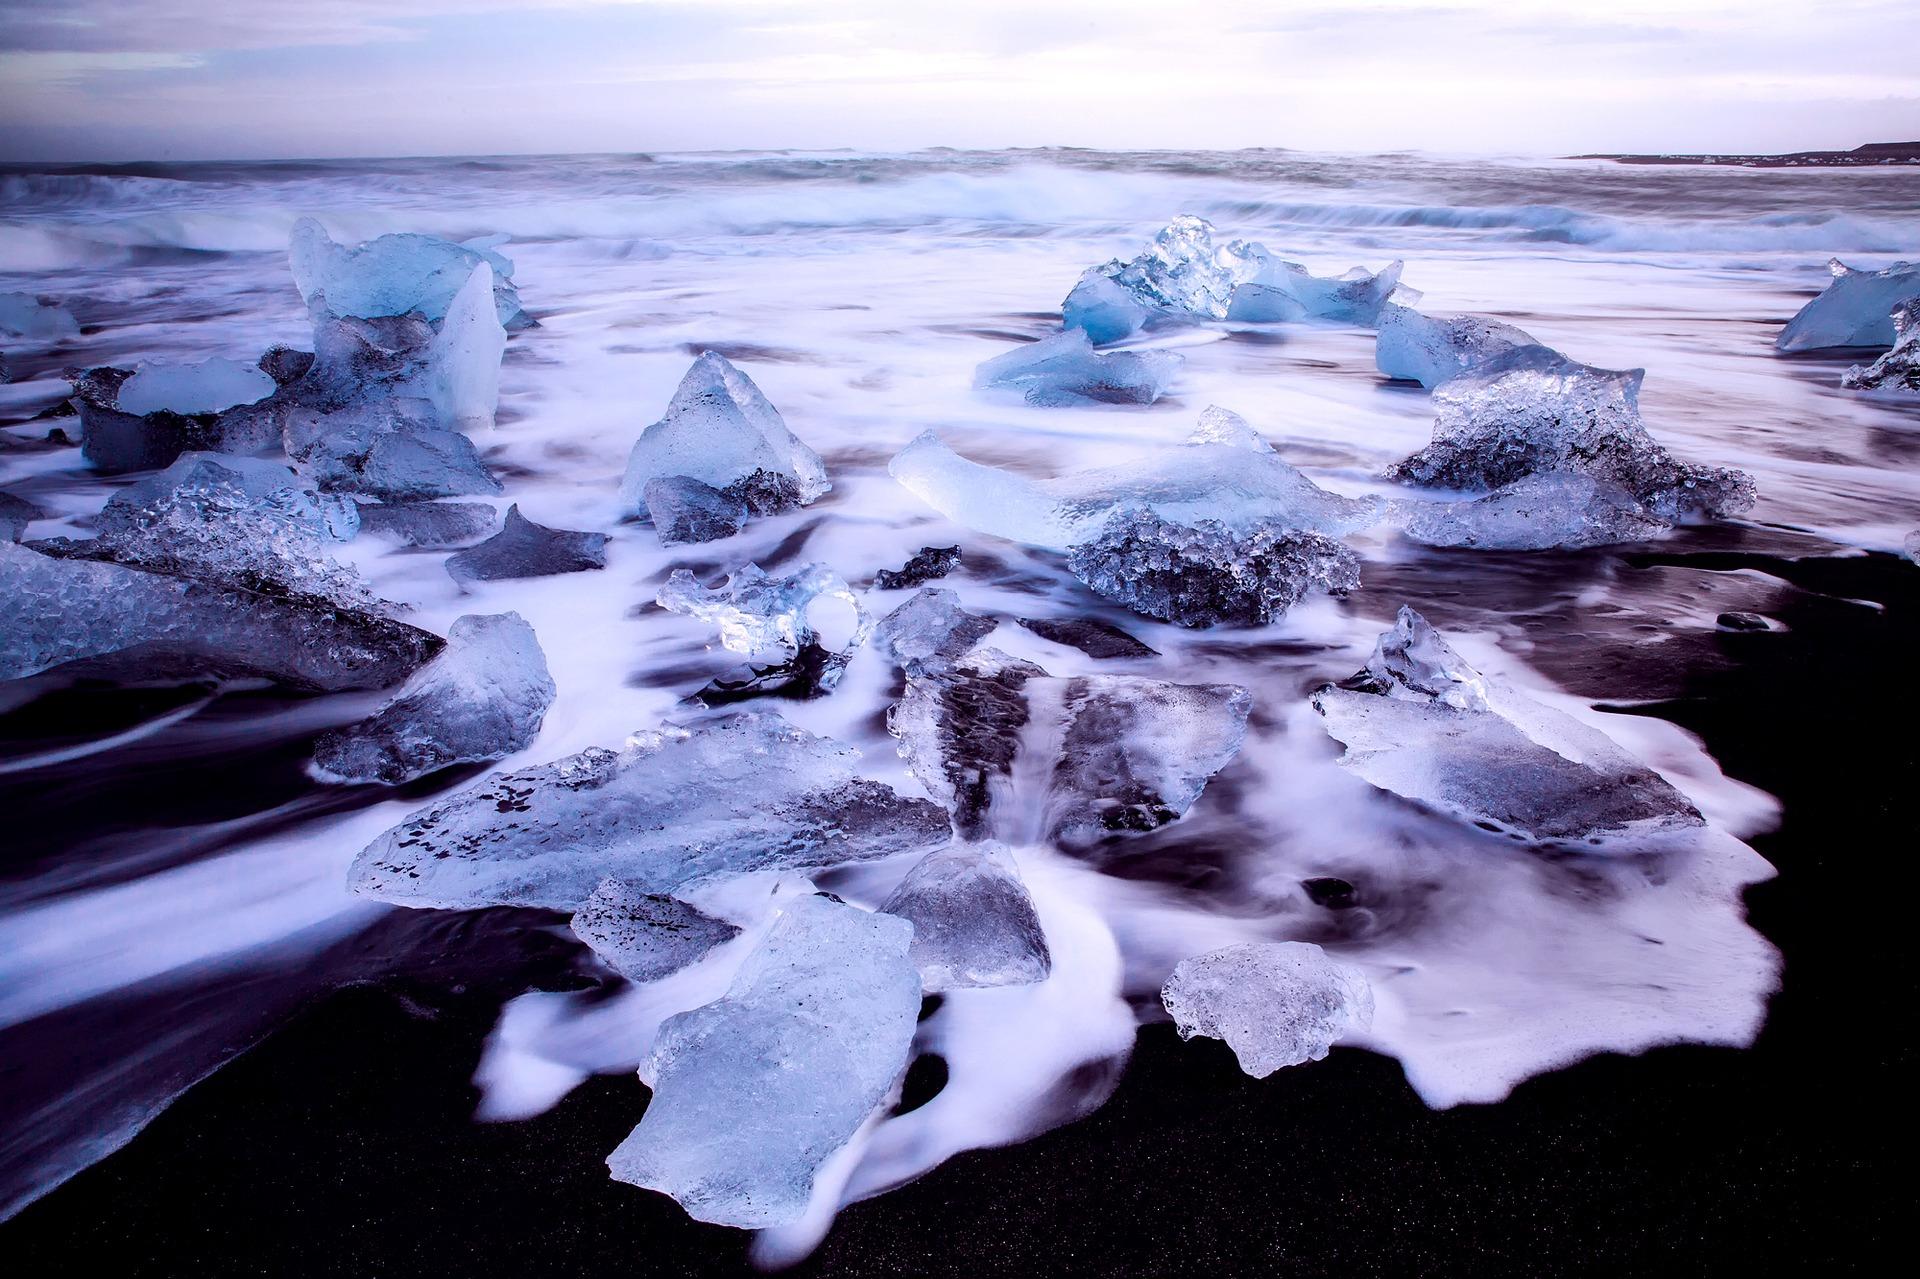 iceland-2361235_1920.jpg